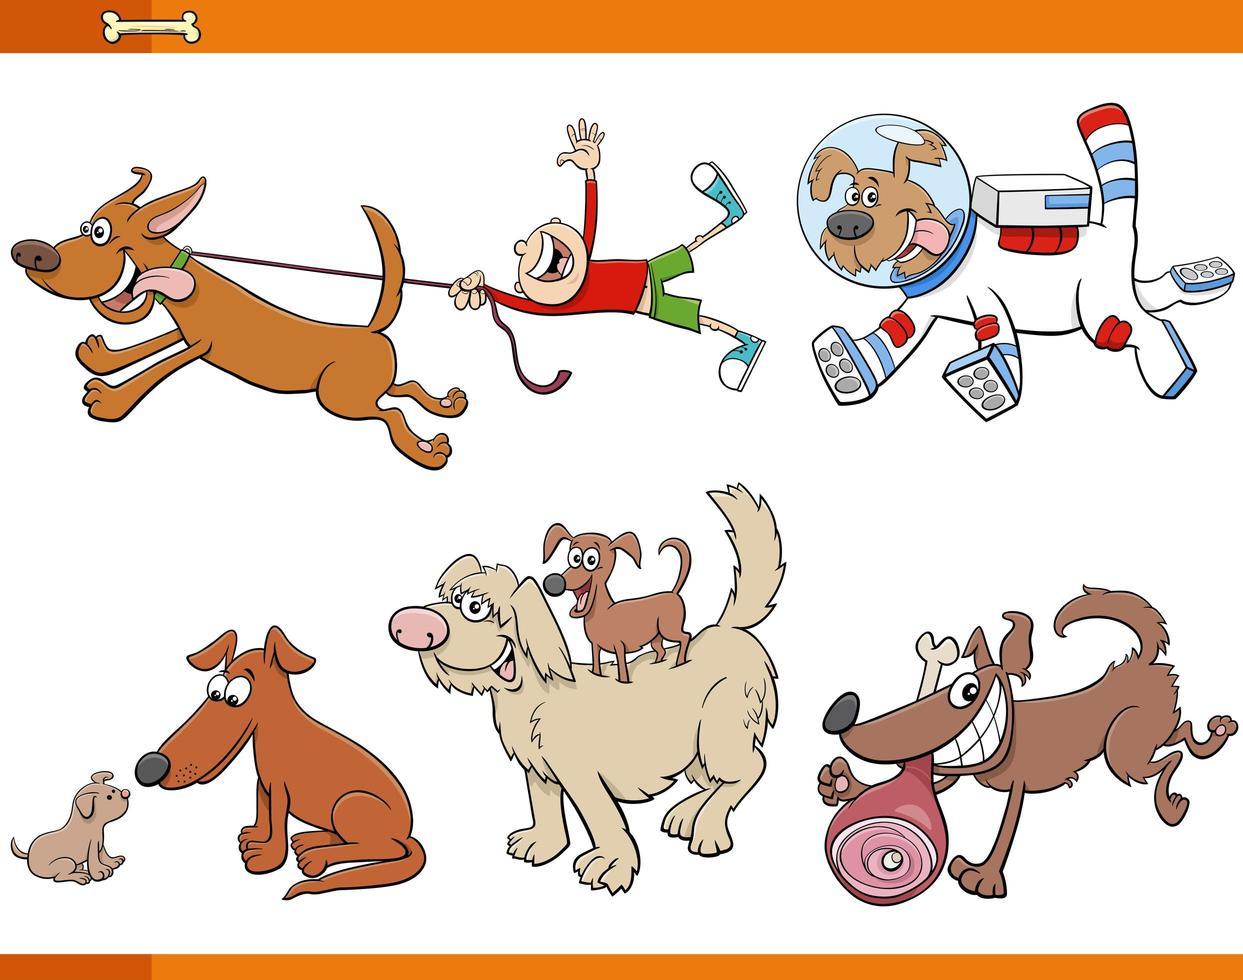 Cartoon Hunde und Welpen Tierfiguren gesetzt vektor